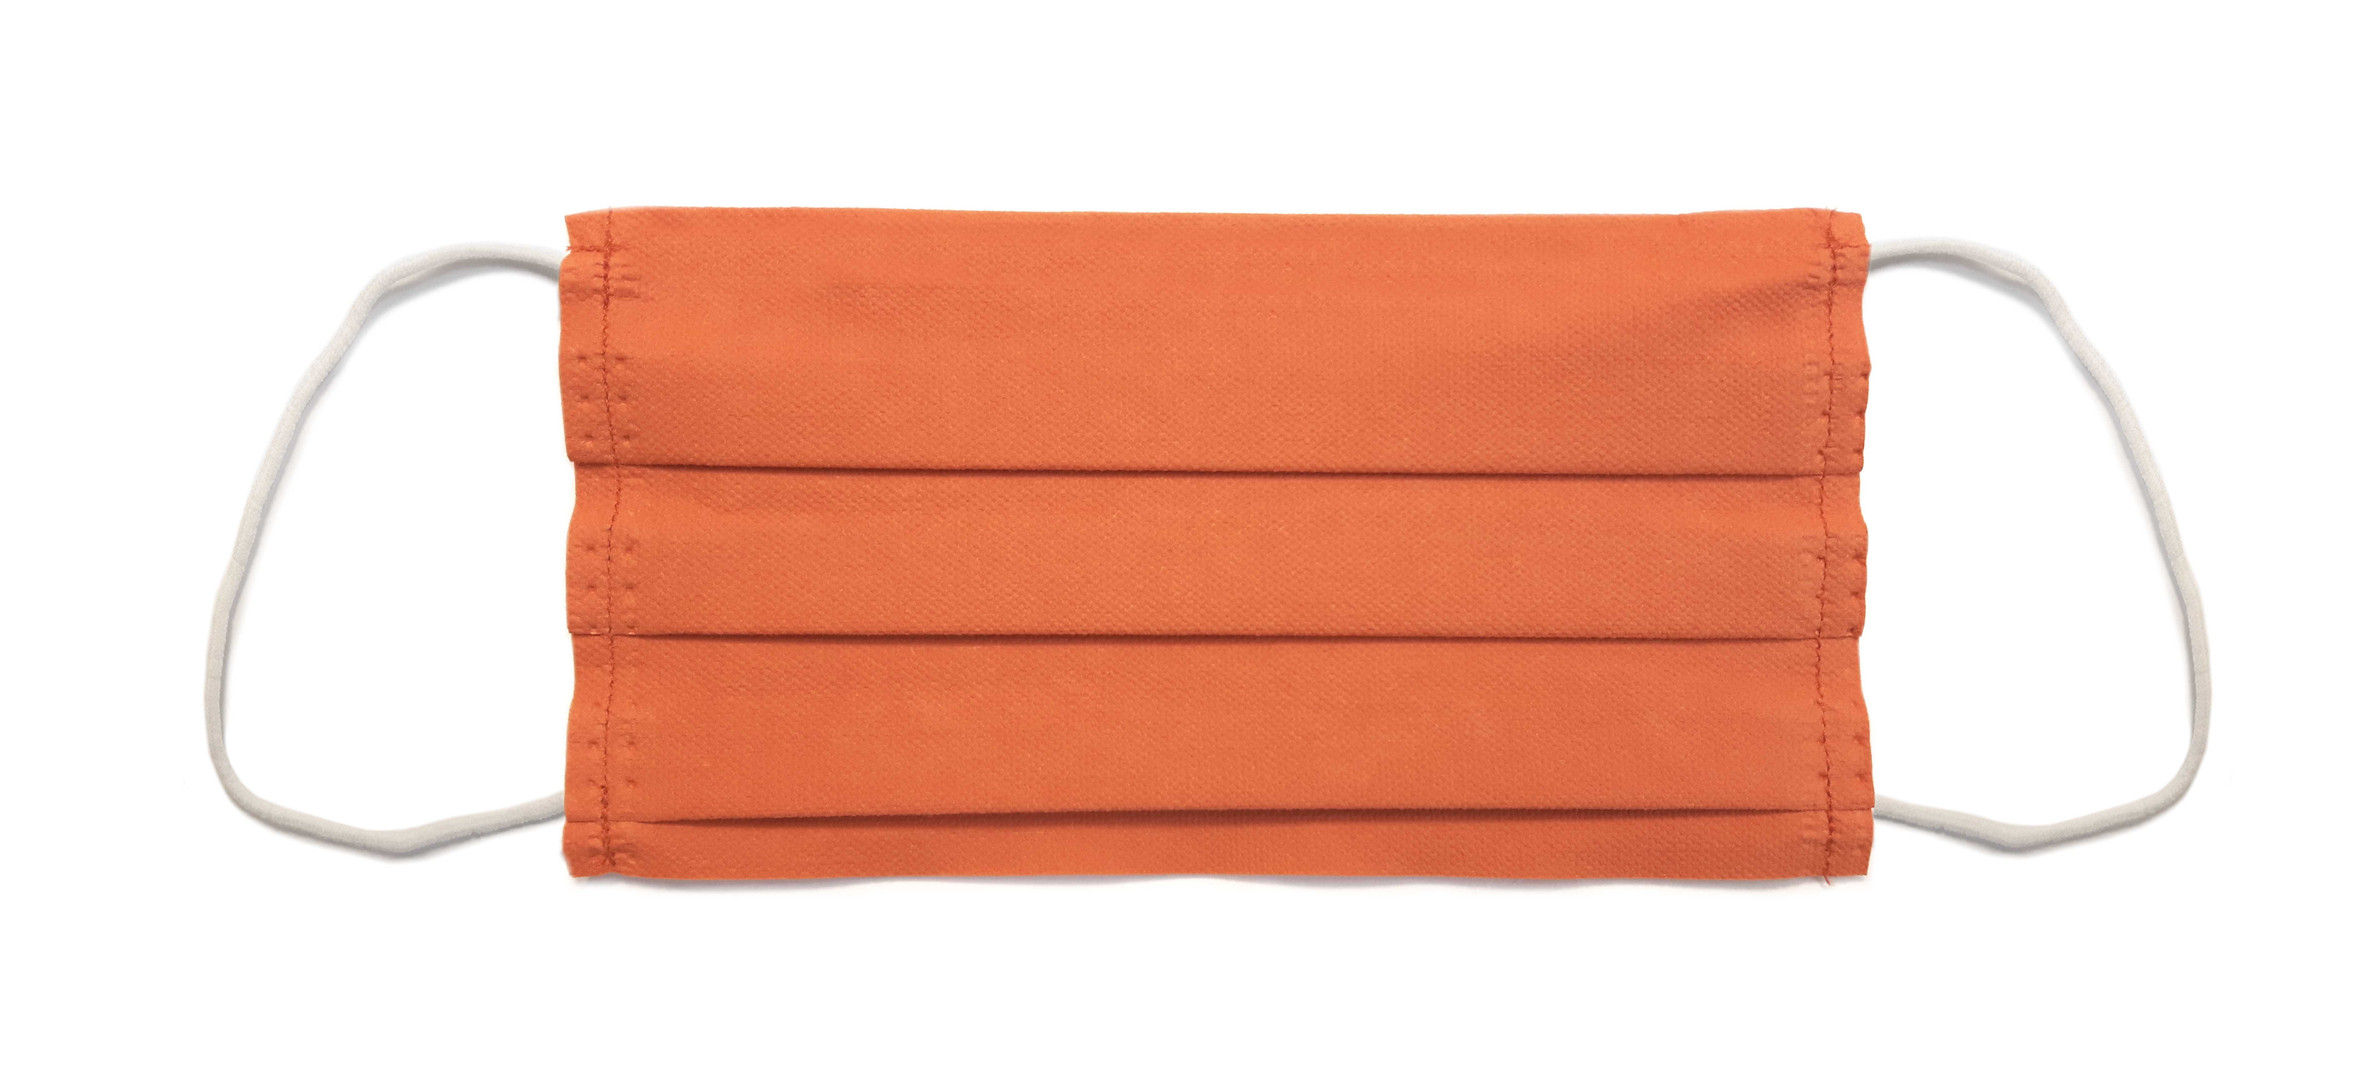 orange (660)_2.jpg